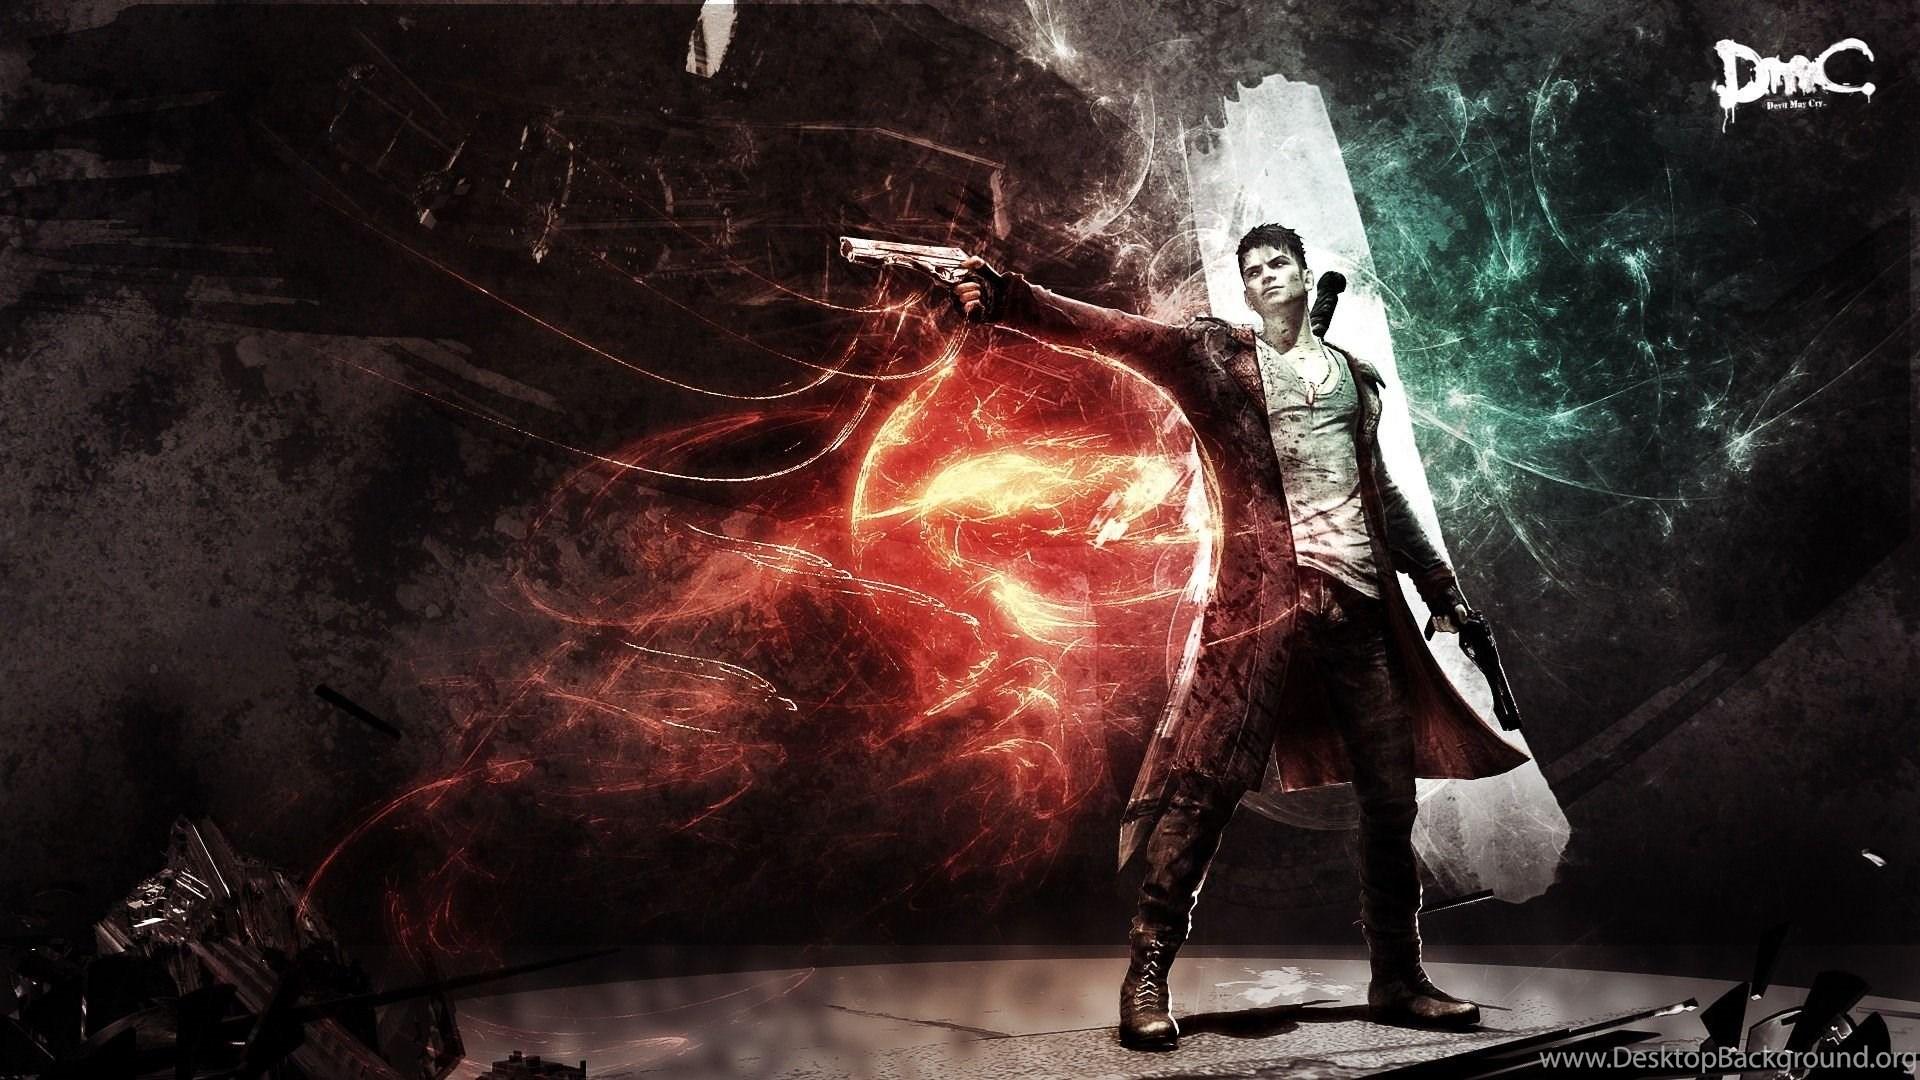 Devil May Cry 5 Dante Wallpaper Desktop Background